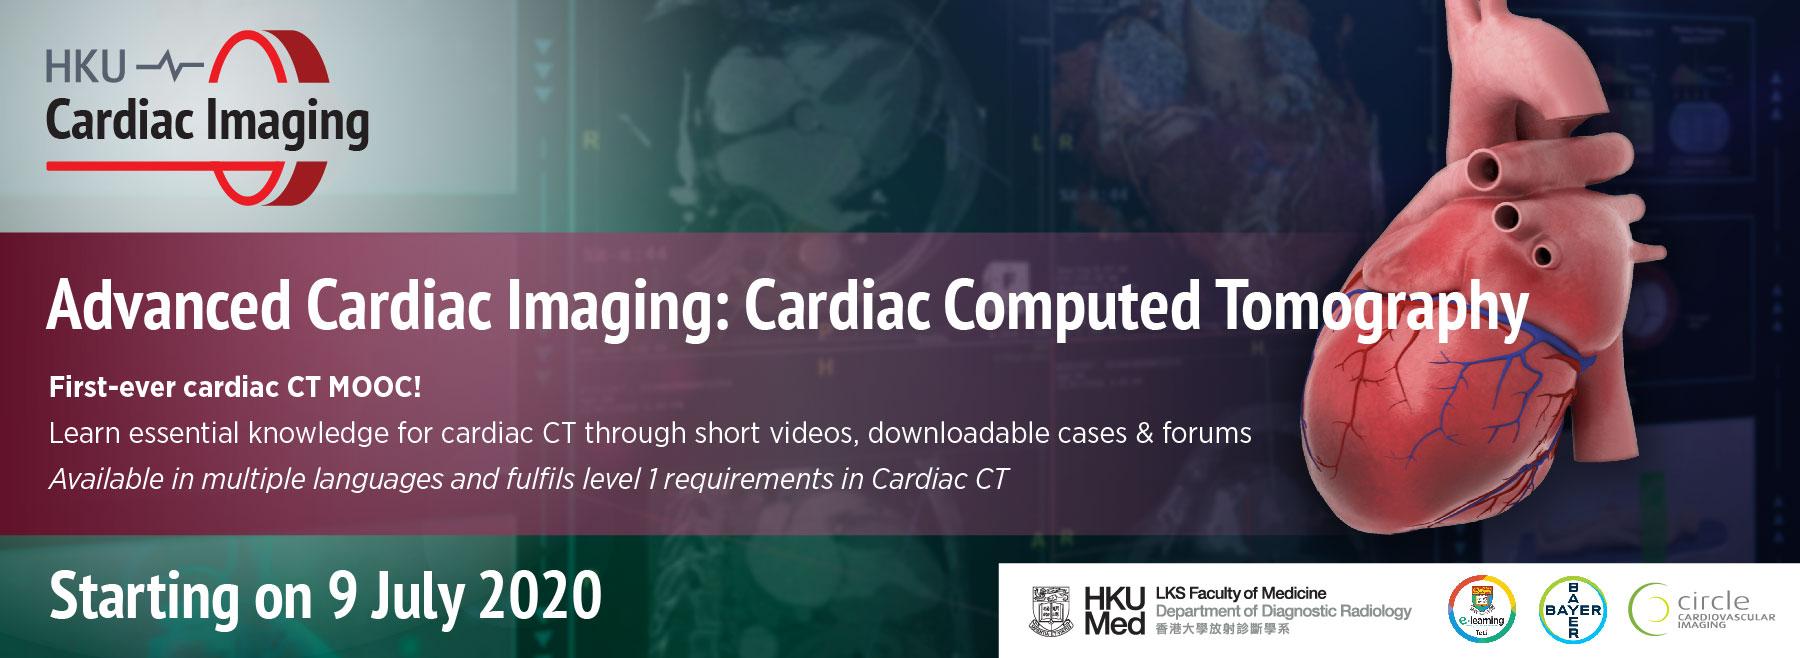 Advanced Cardiac Imaging: Cardiac Computed Tomography